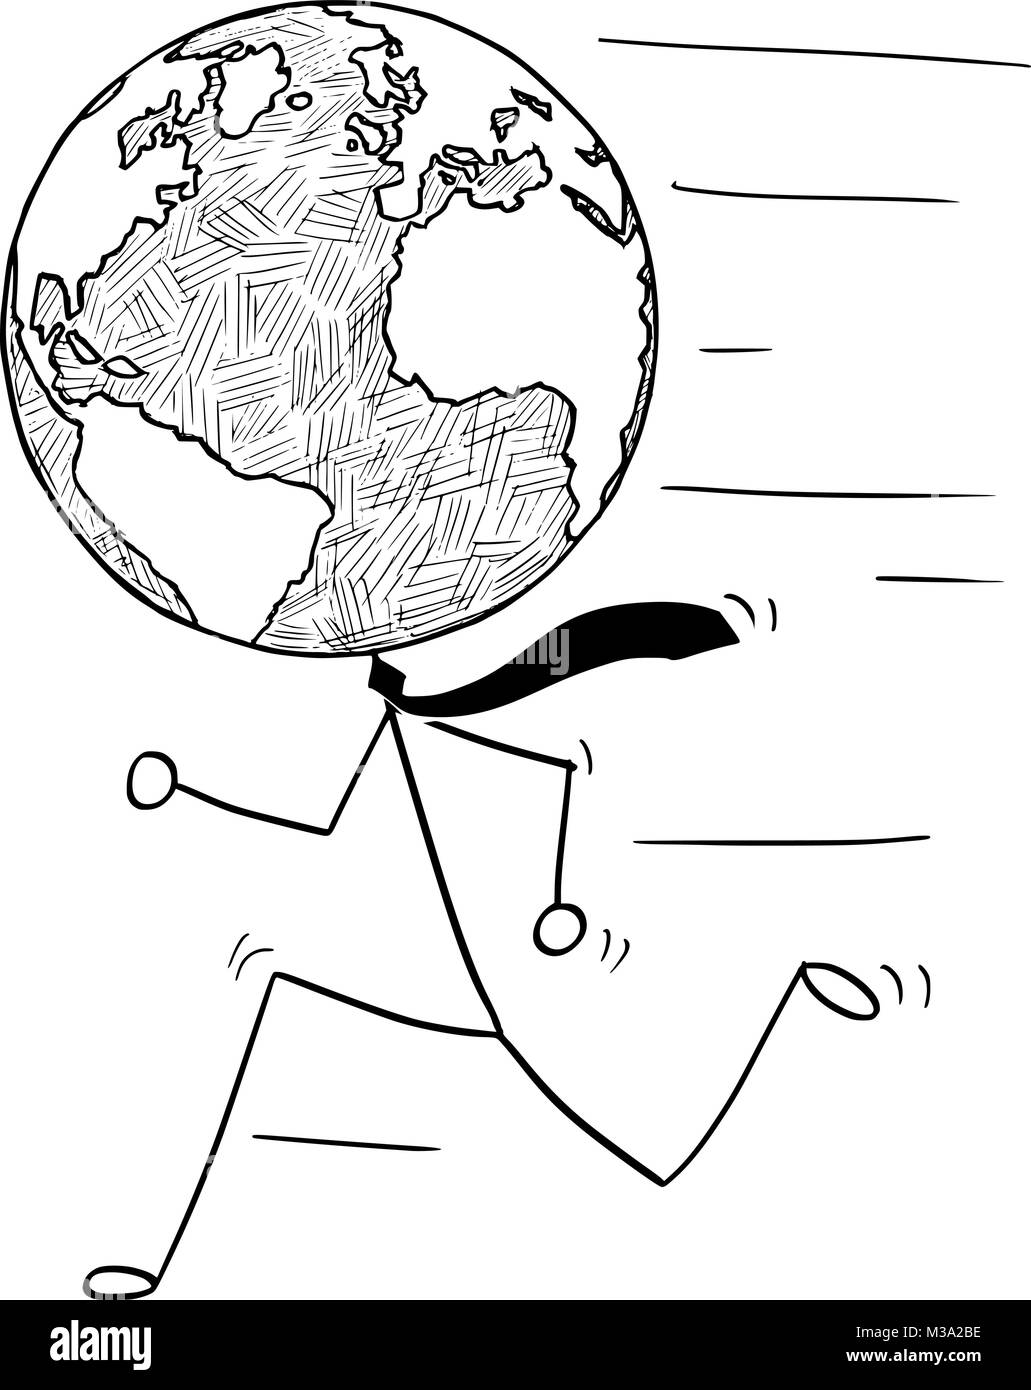 Cartoon of Running Businessman with Earth World Globe as Head - Stock Image